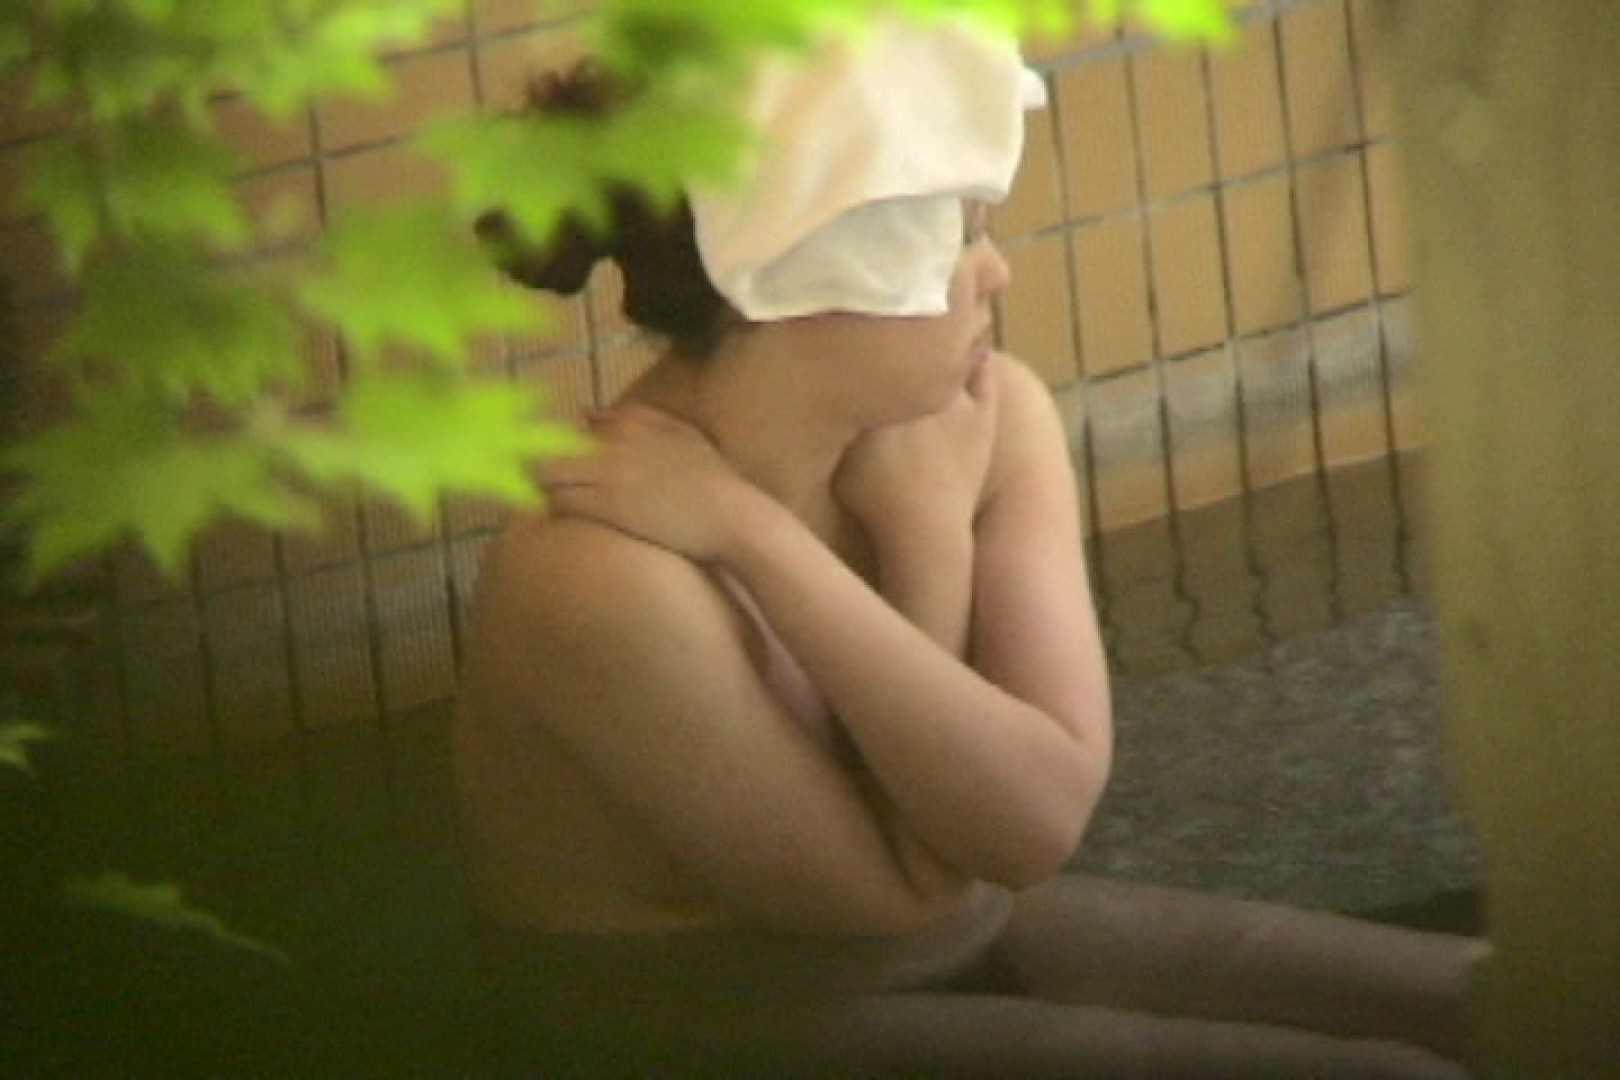 Aquaな露天風呂Vol.456 盗撮 | HなOL  102pic 51